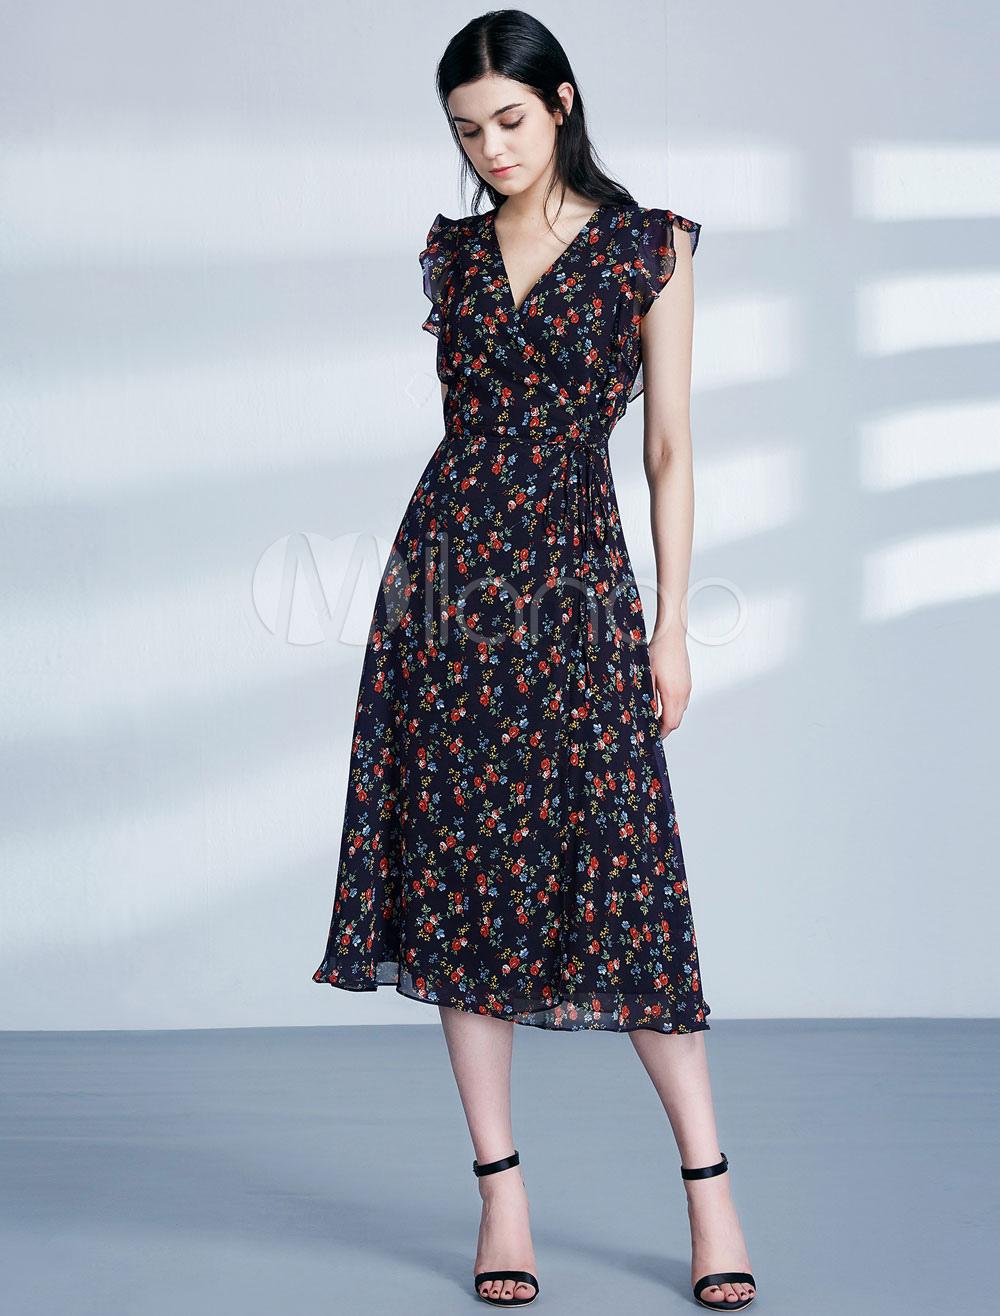 Black Party Dress Floral Print V Neck Tea Length Wedding Guest Dress